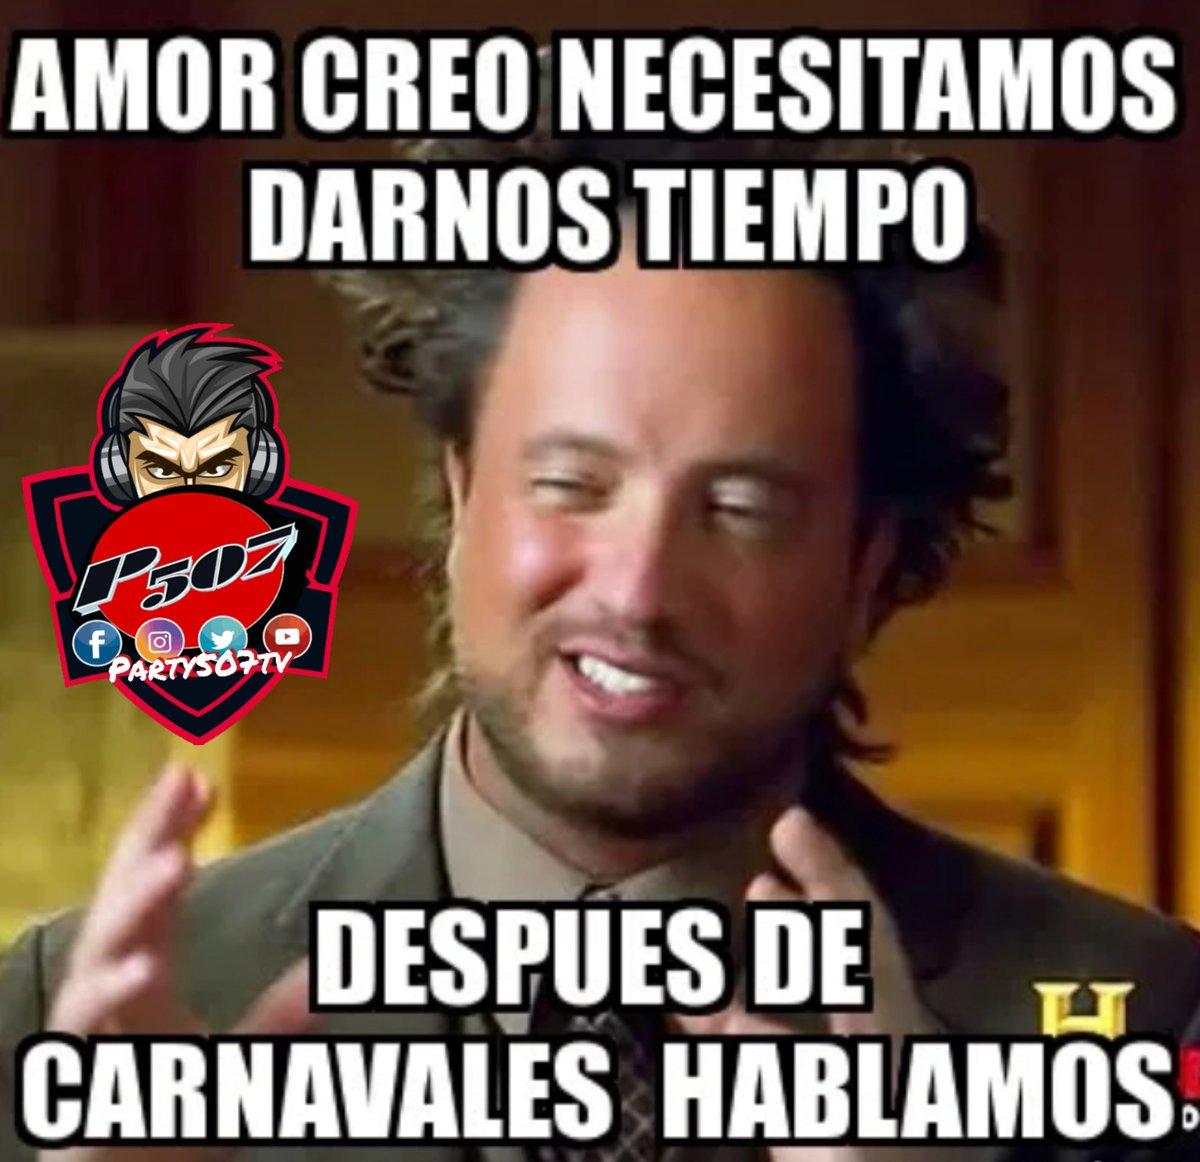 #party507tv #memes #humor #humornegro #humoramarillo #humorista #humorgrafico #risa #risas #videosderisas #videosgraciosos #videoviral #risasaseguradas #risascontagiosas #risasymasrisas #graciosopic.twitter.com/LVHEgDiJpU